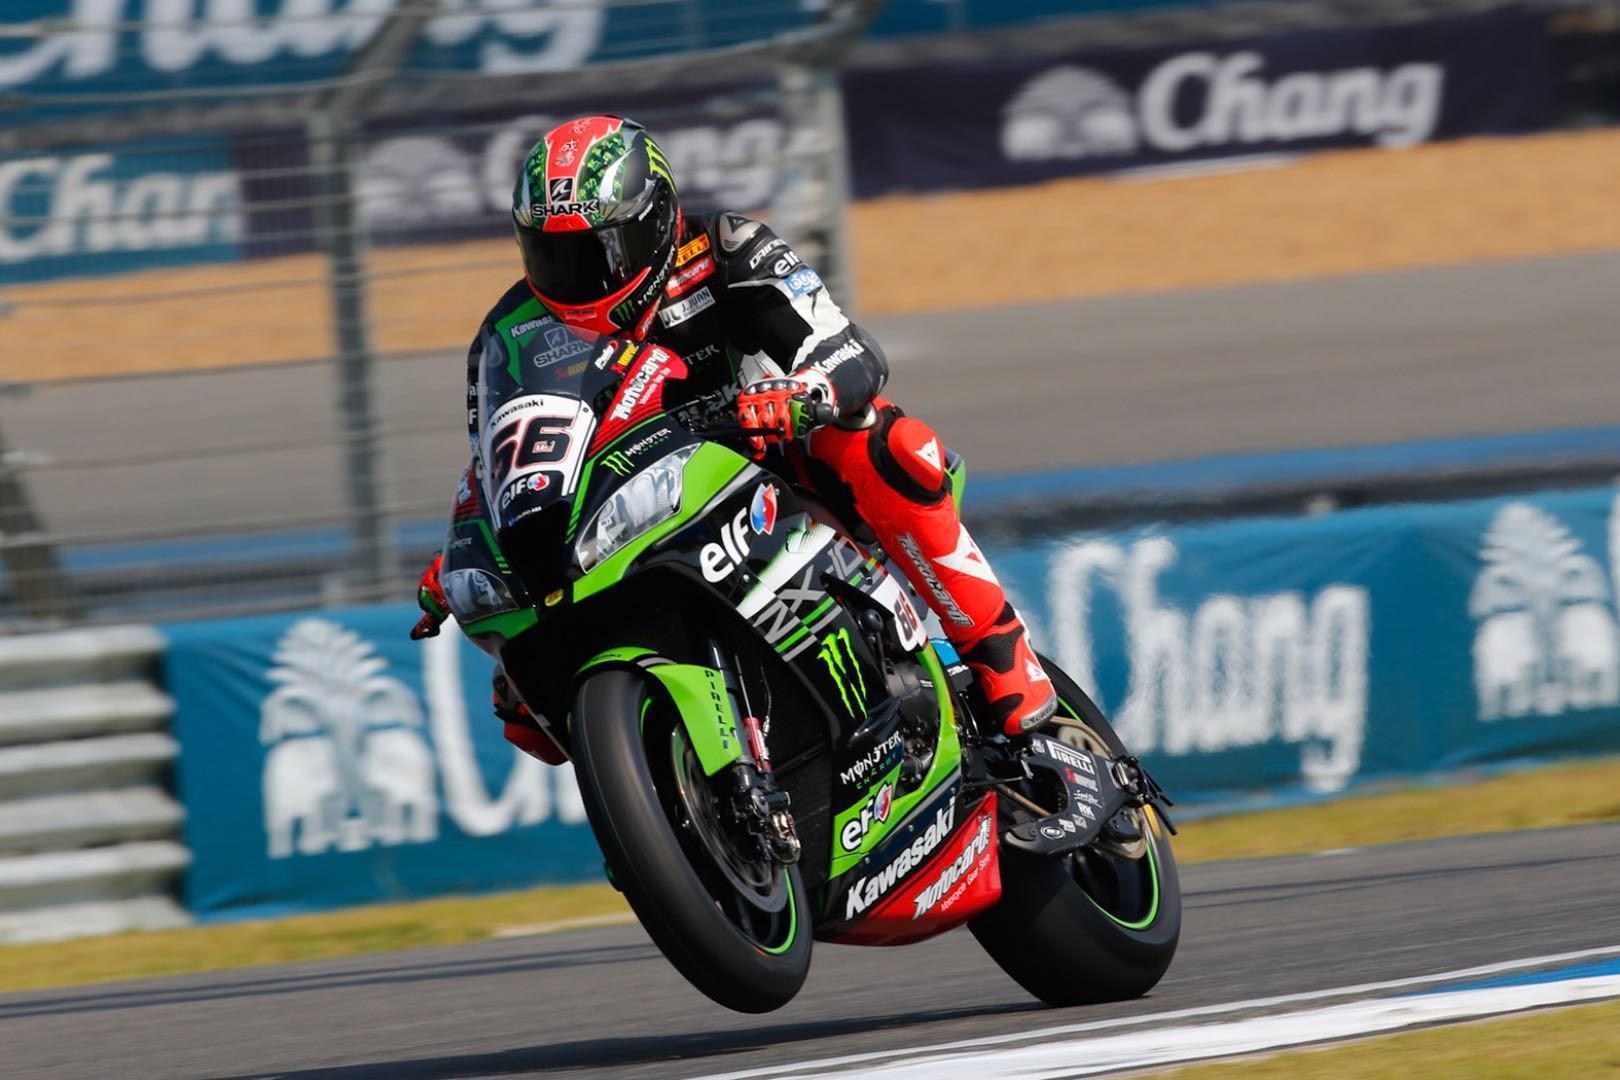 2017 Thailand World Superbike Friday Practice: Kawasaki's Tom Sykes